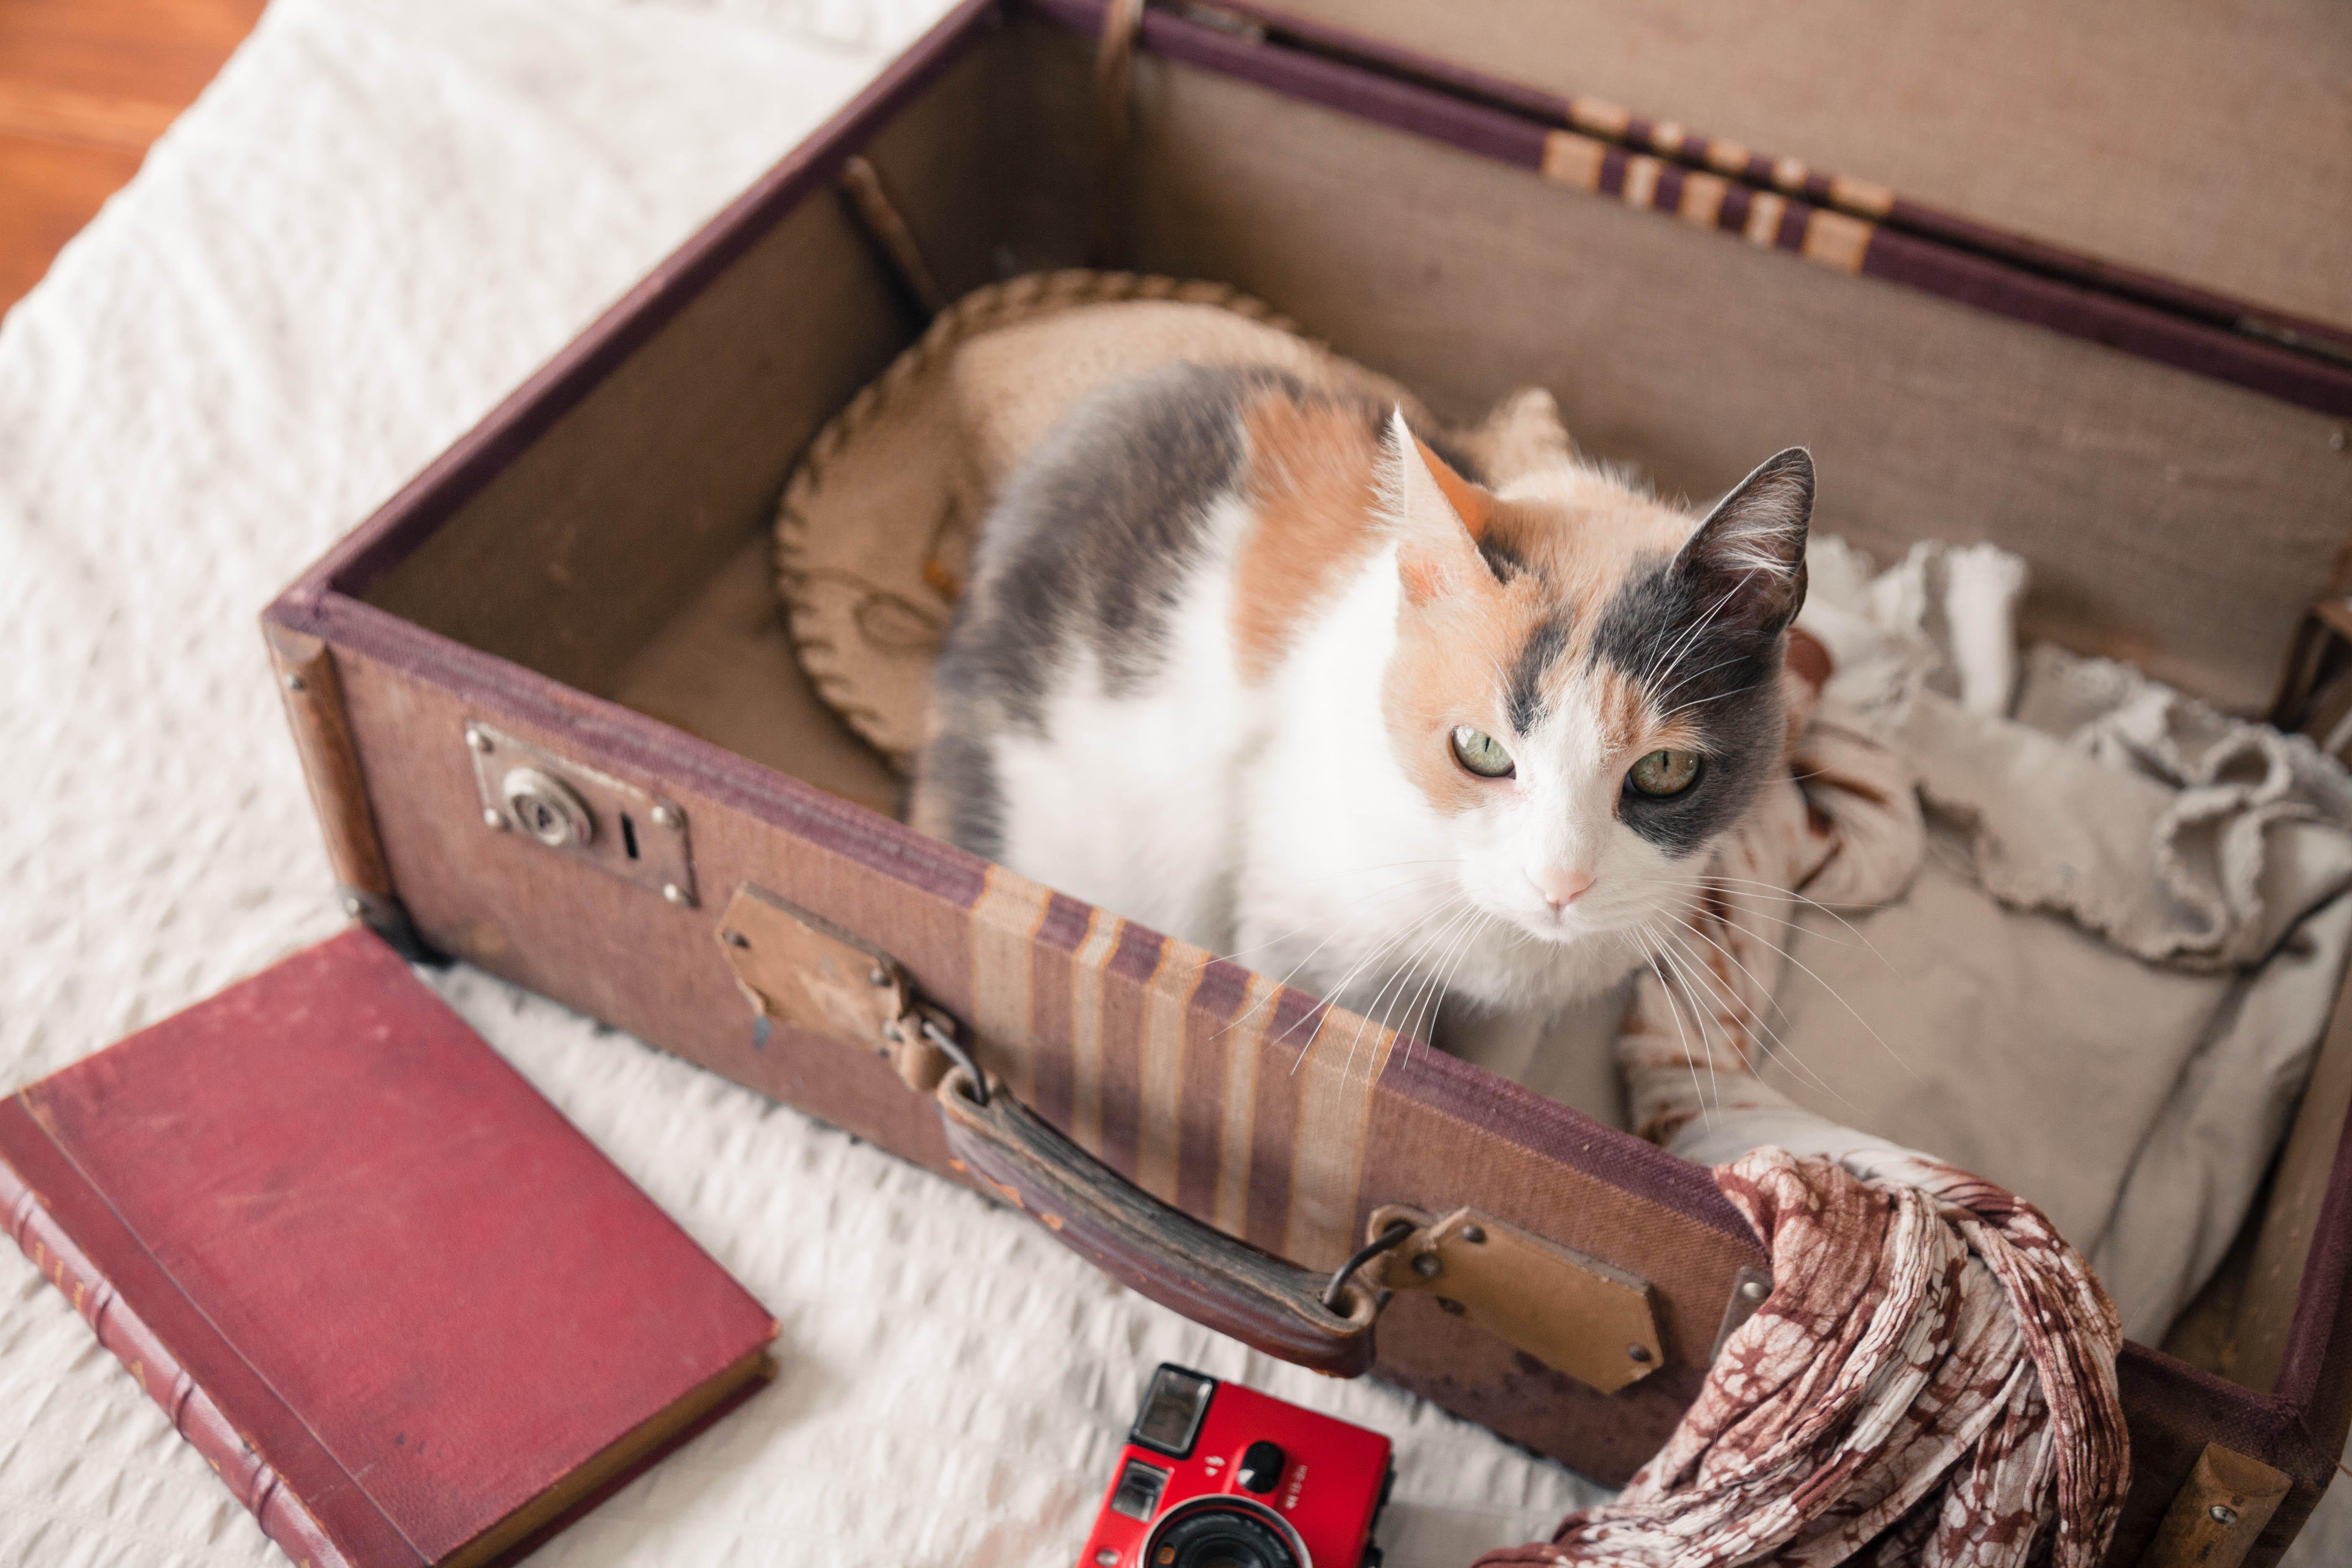 Urlaub mit Katze, Katze in Koffer